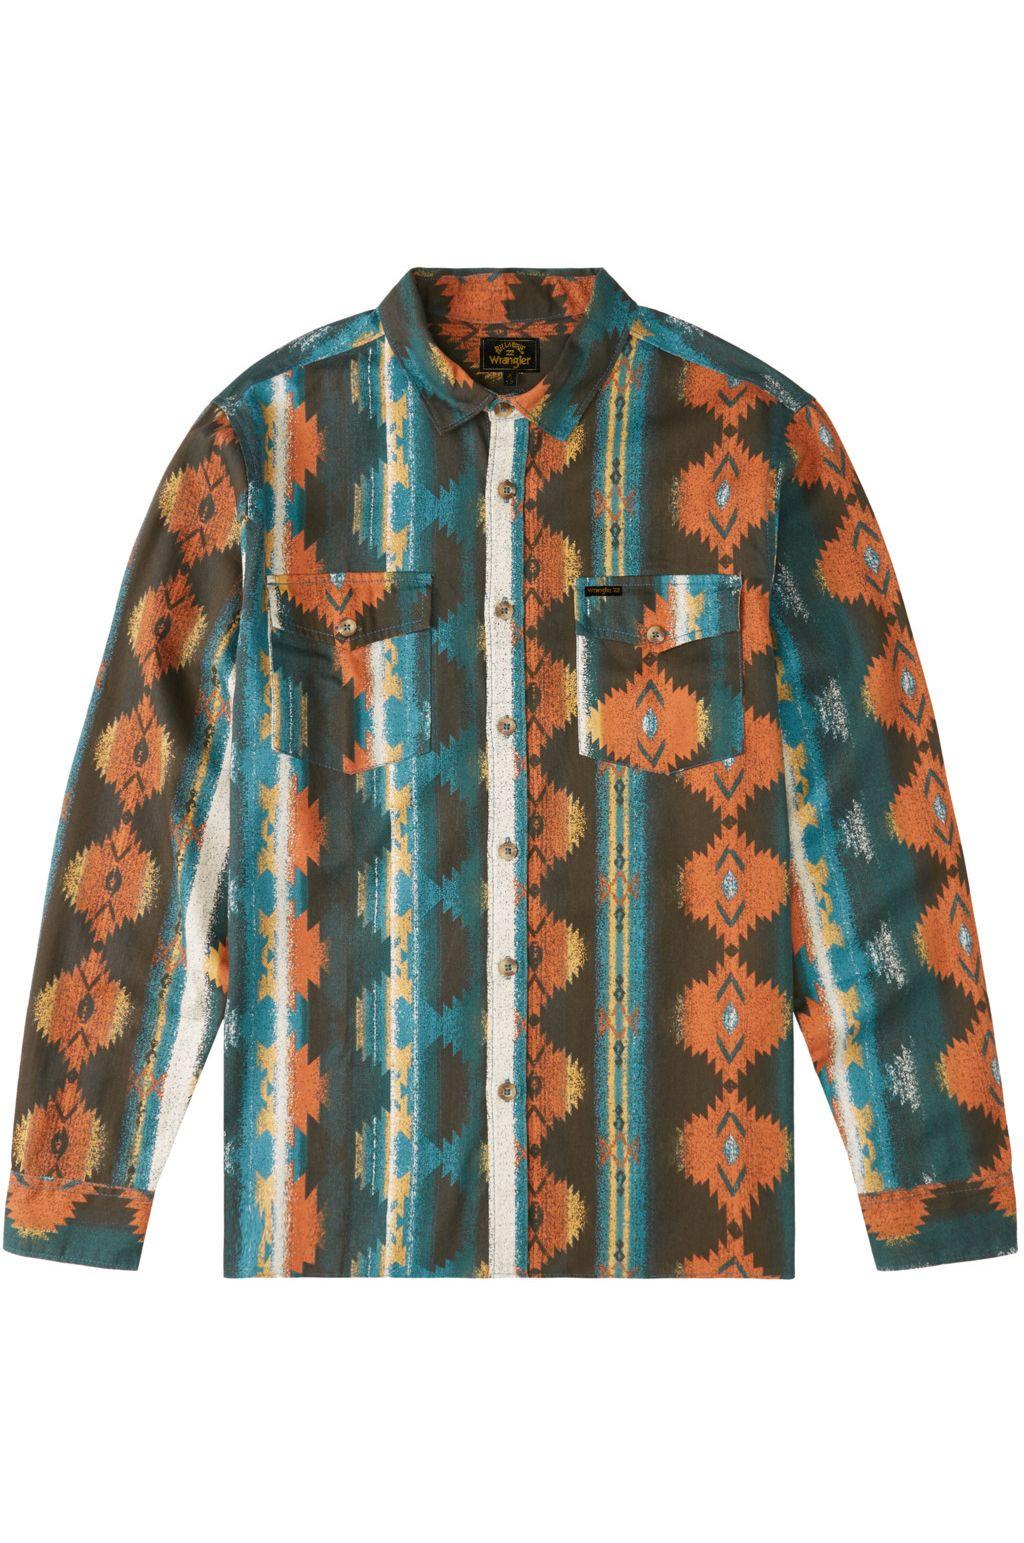 Billabong Shirt WESTWARD TWILL LS WRANGLER. Coffee